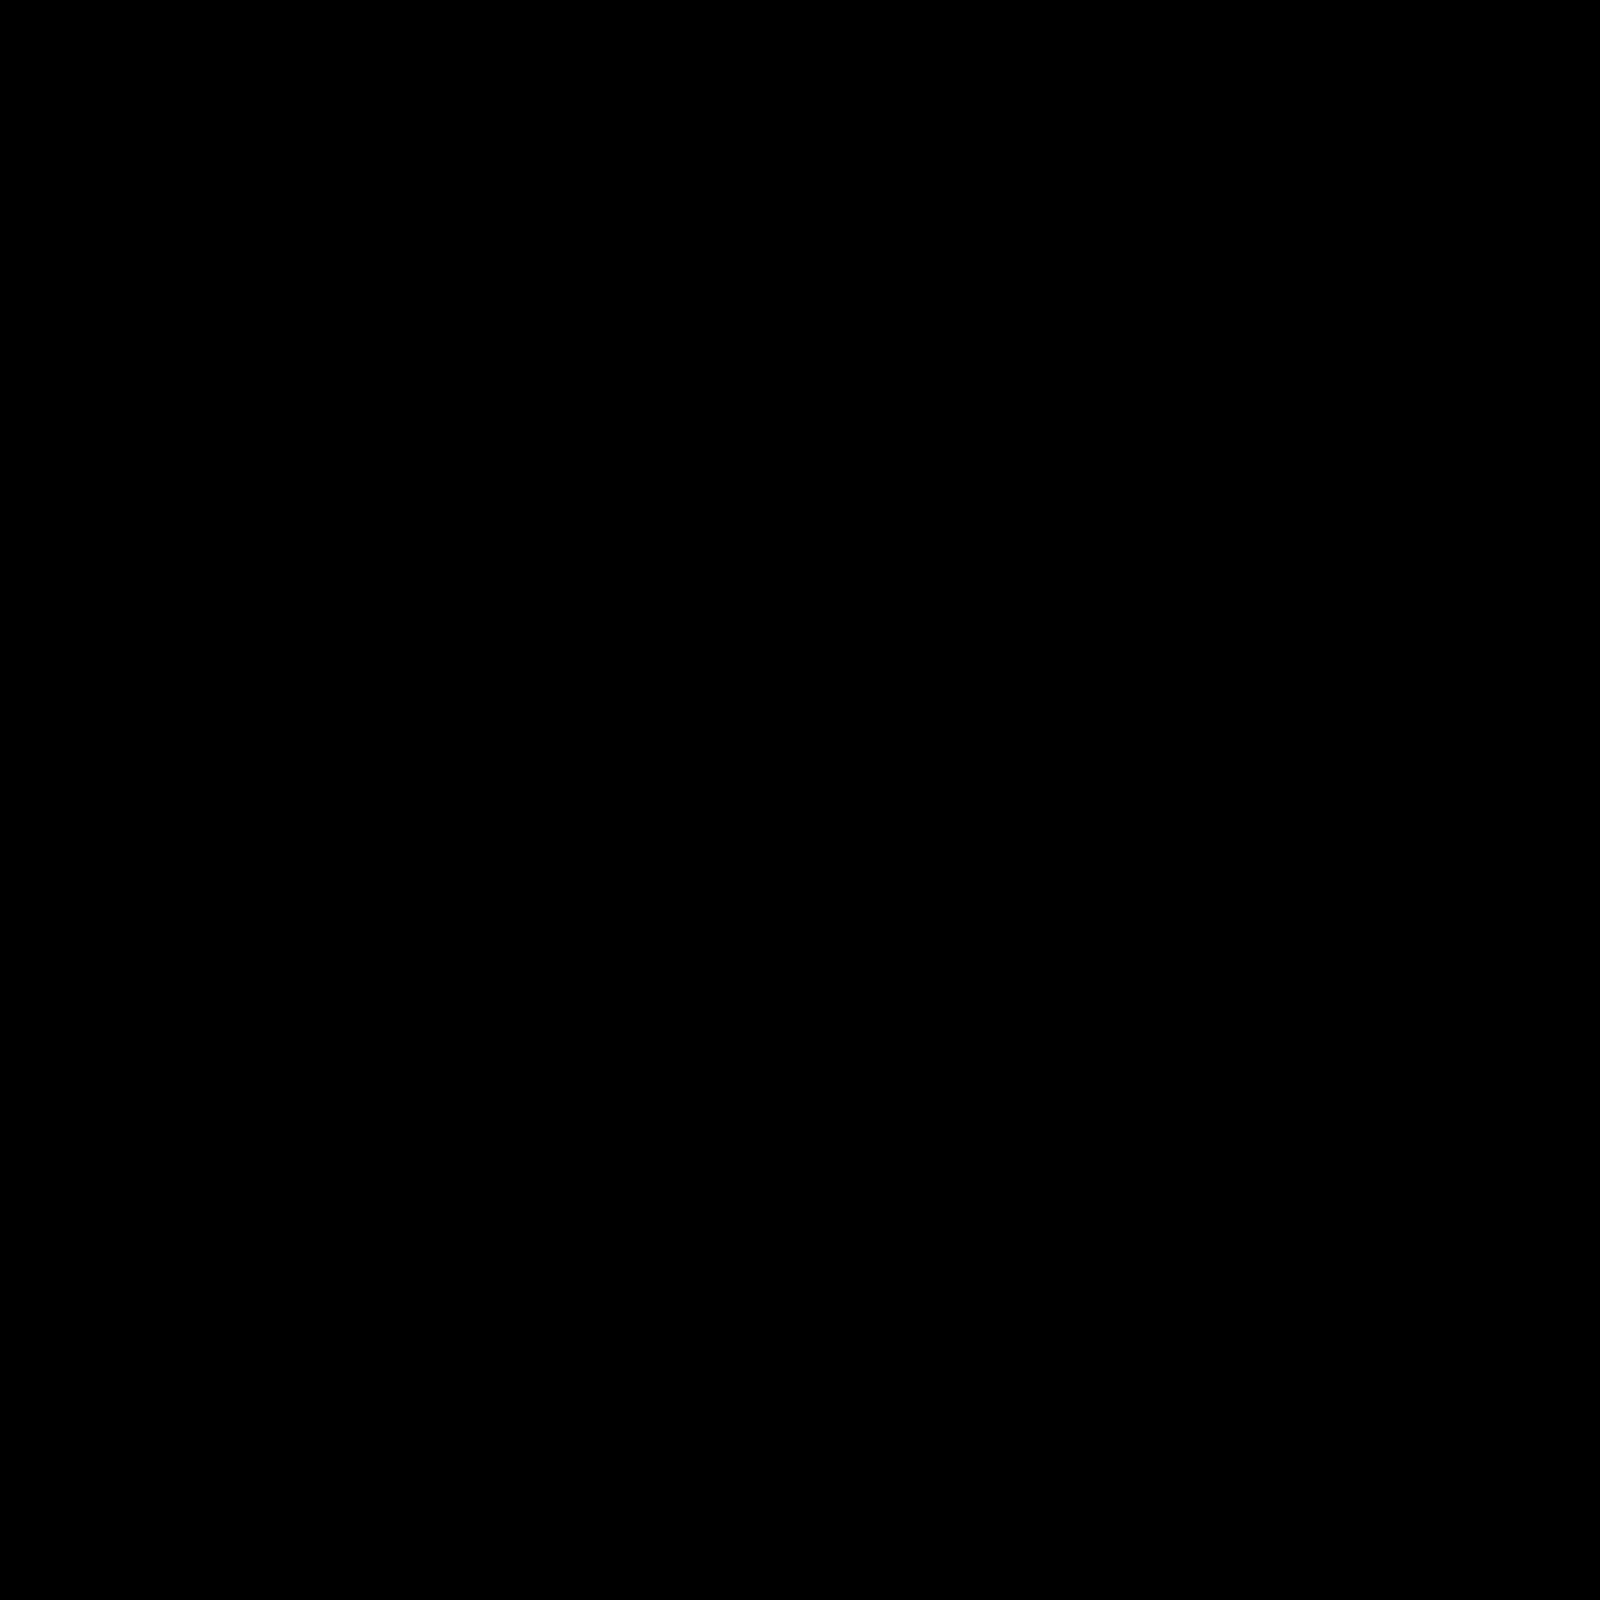 Apple shape of letter a clipart vector transparent stock GOG.com